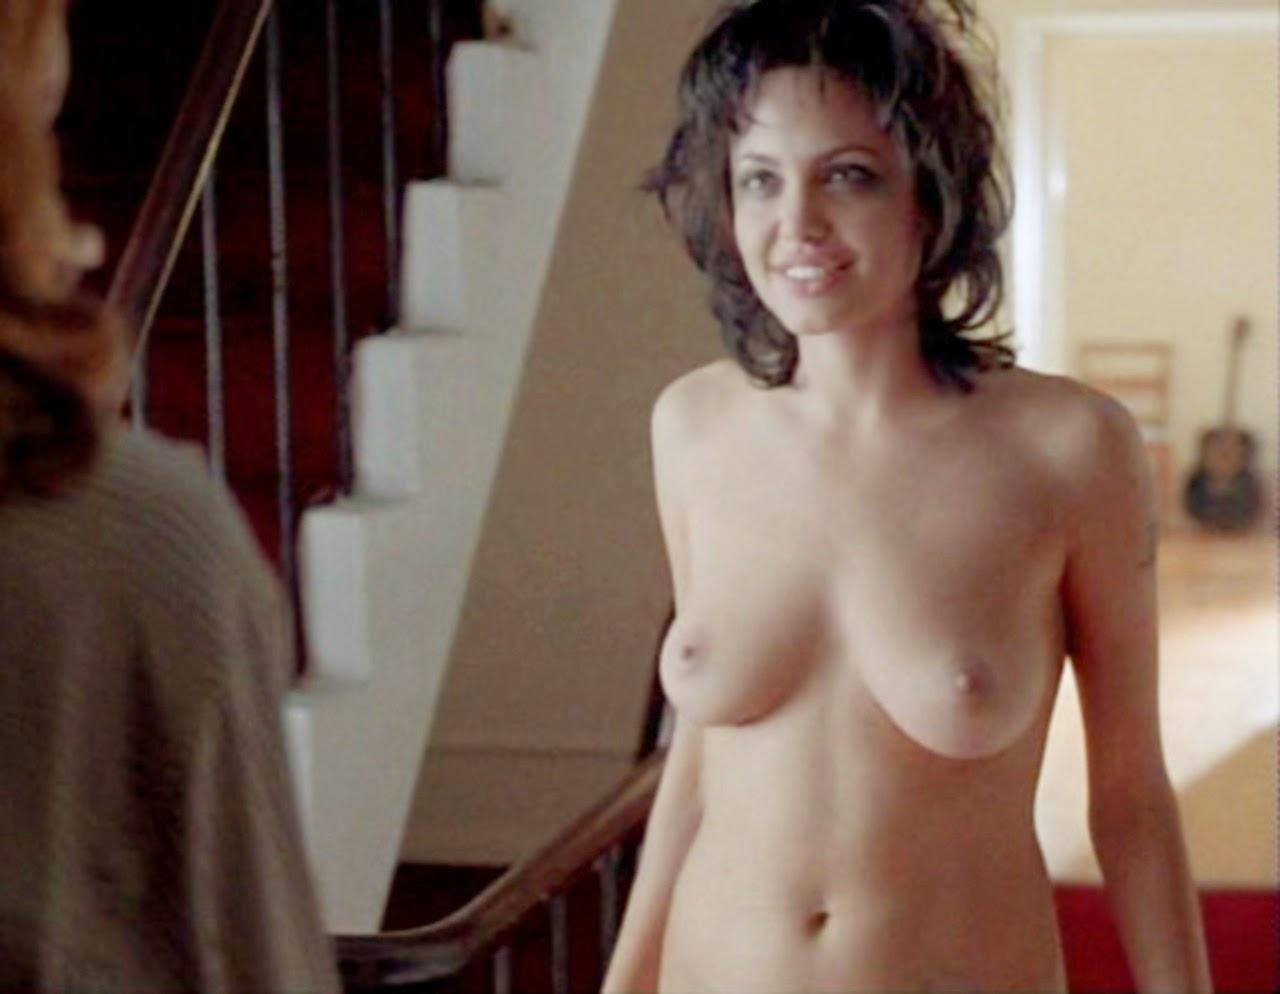 Angelina Jolienude hot naked chicks!: angelina jolie nude!